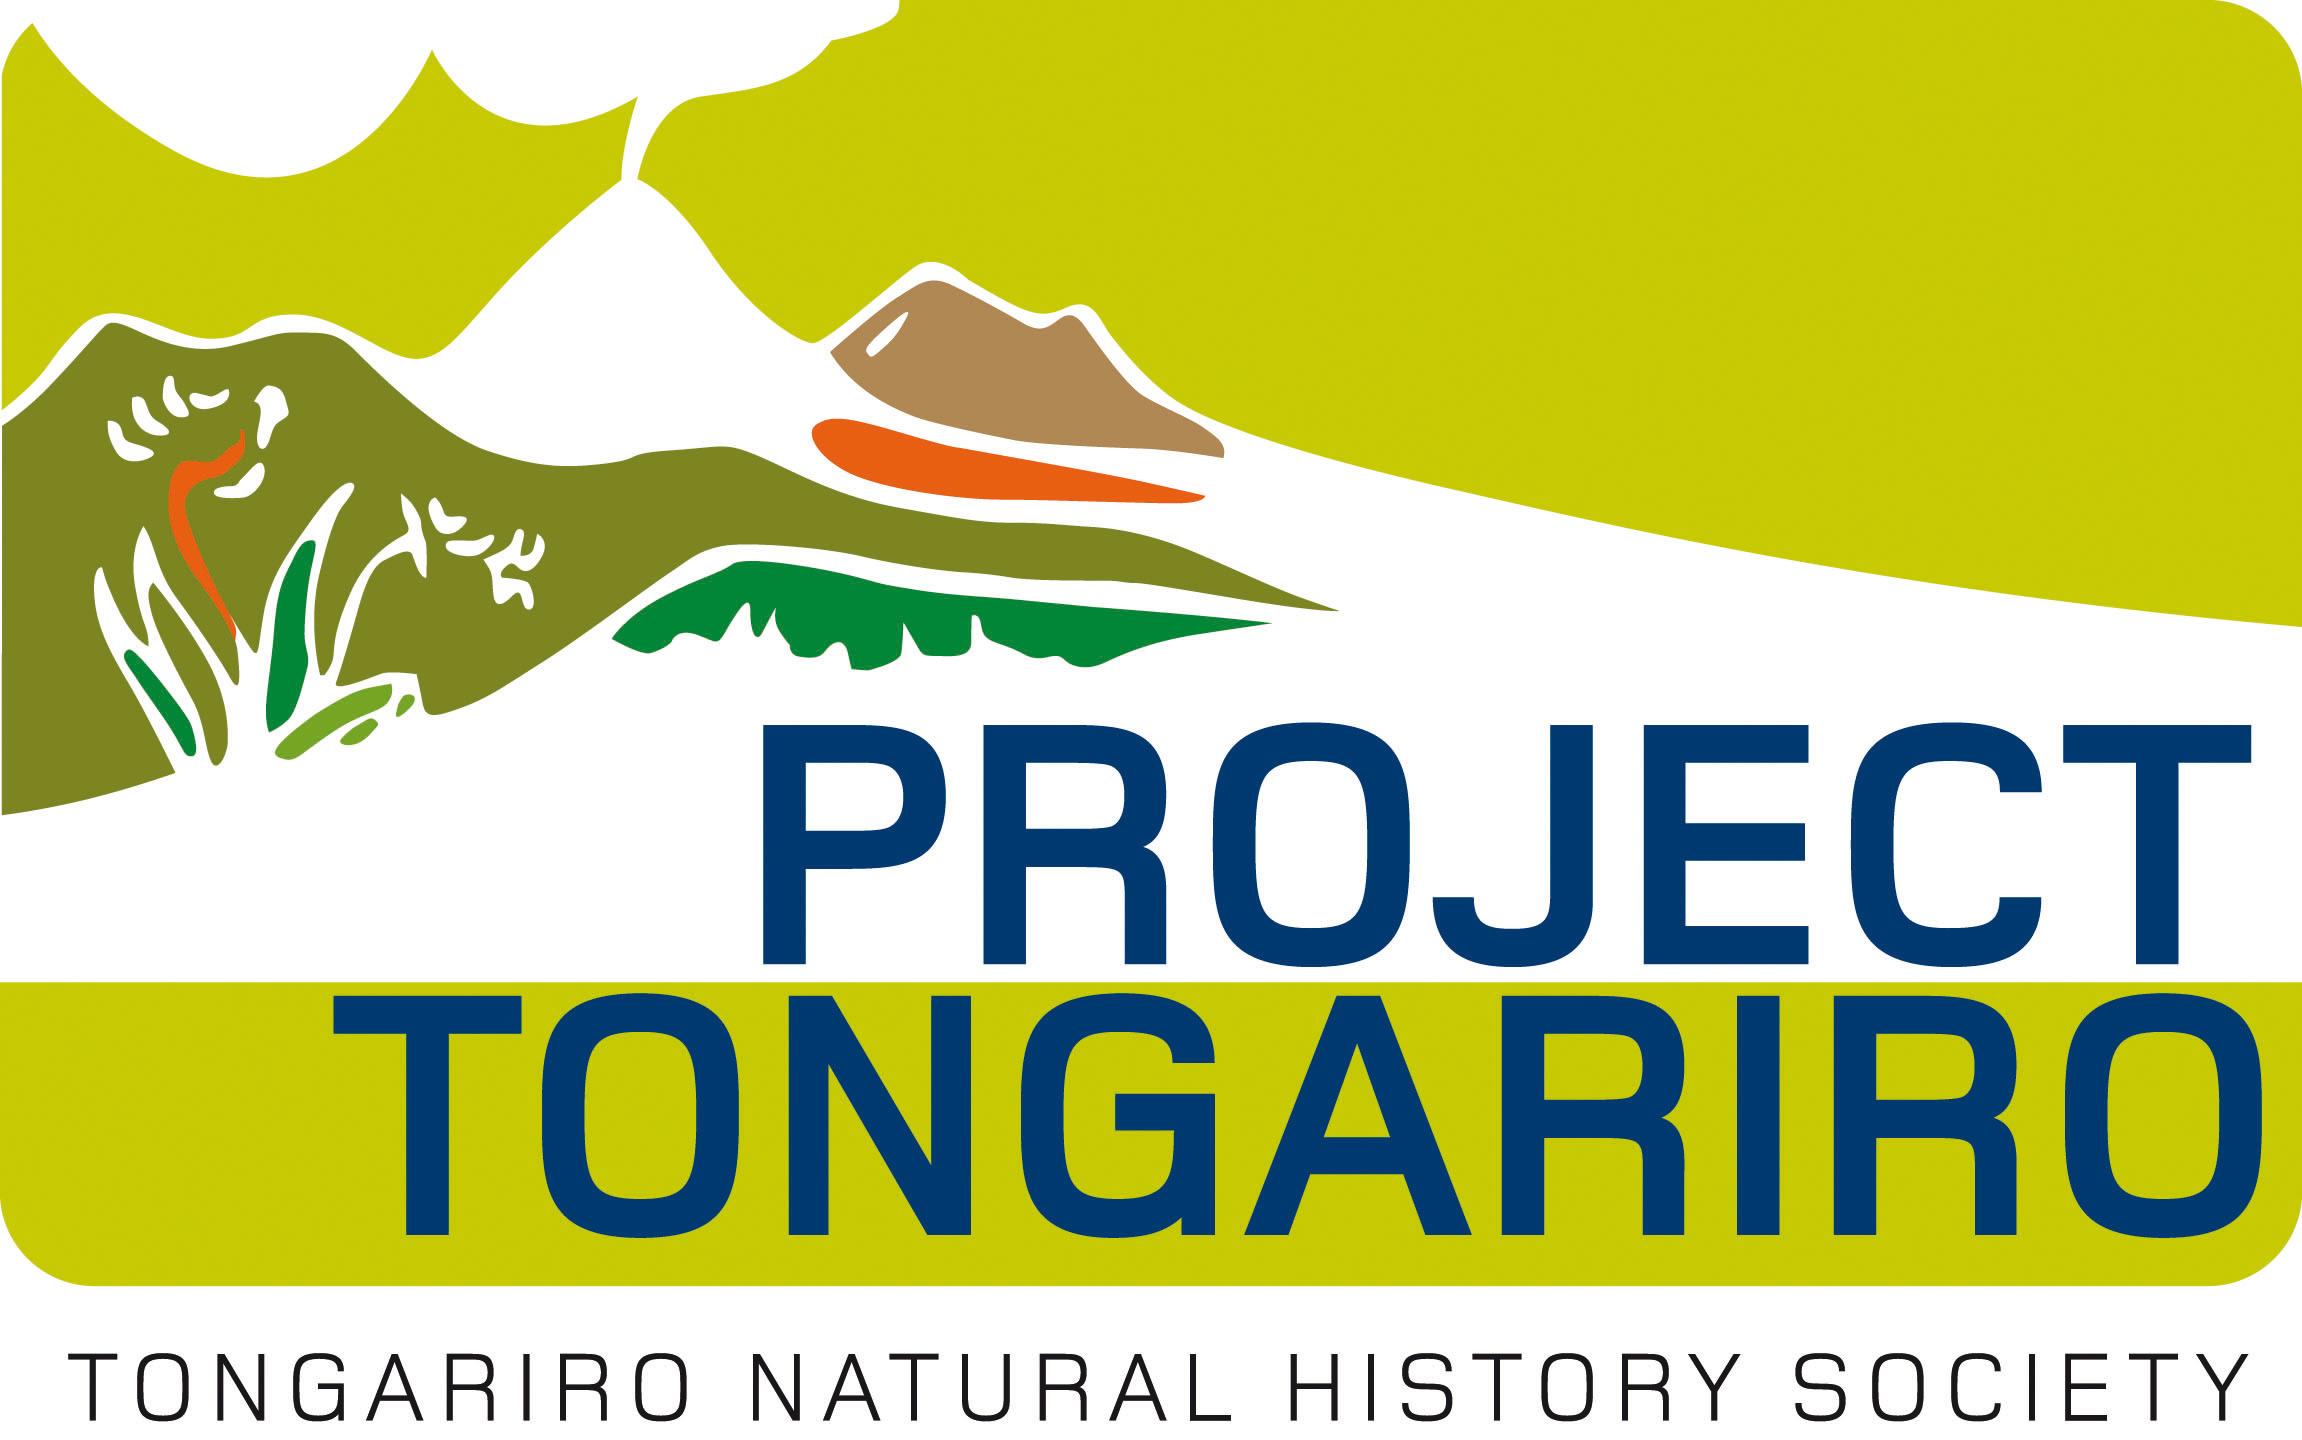 Project Tongariro